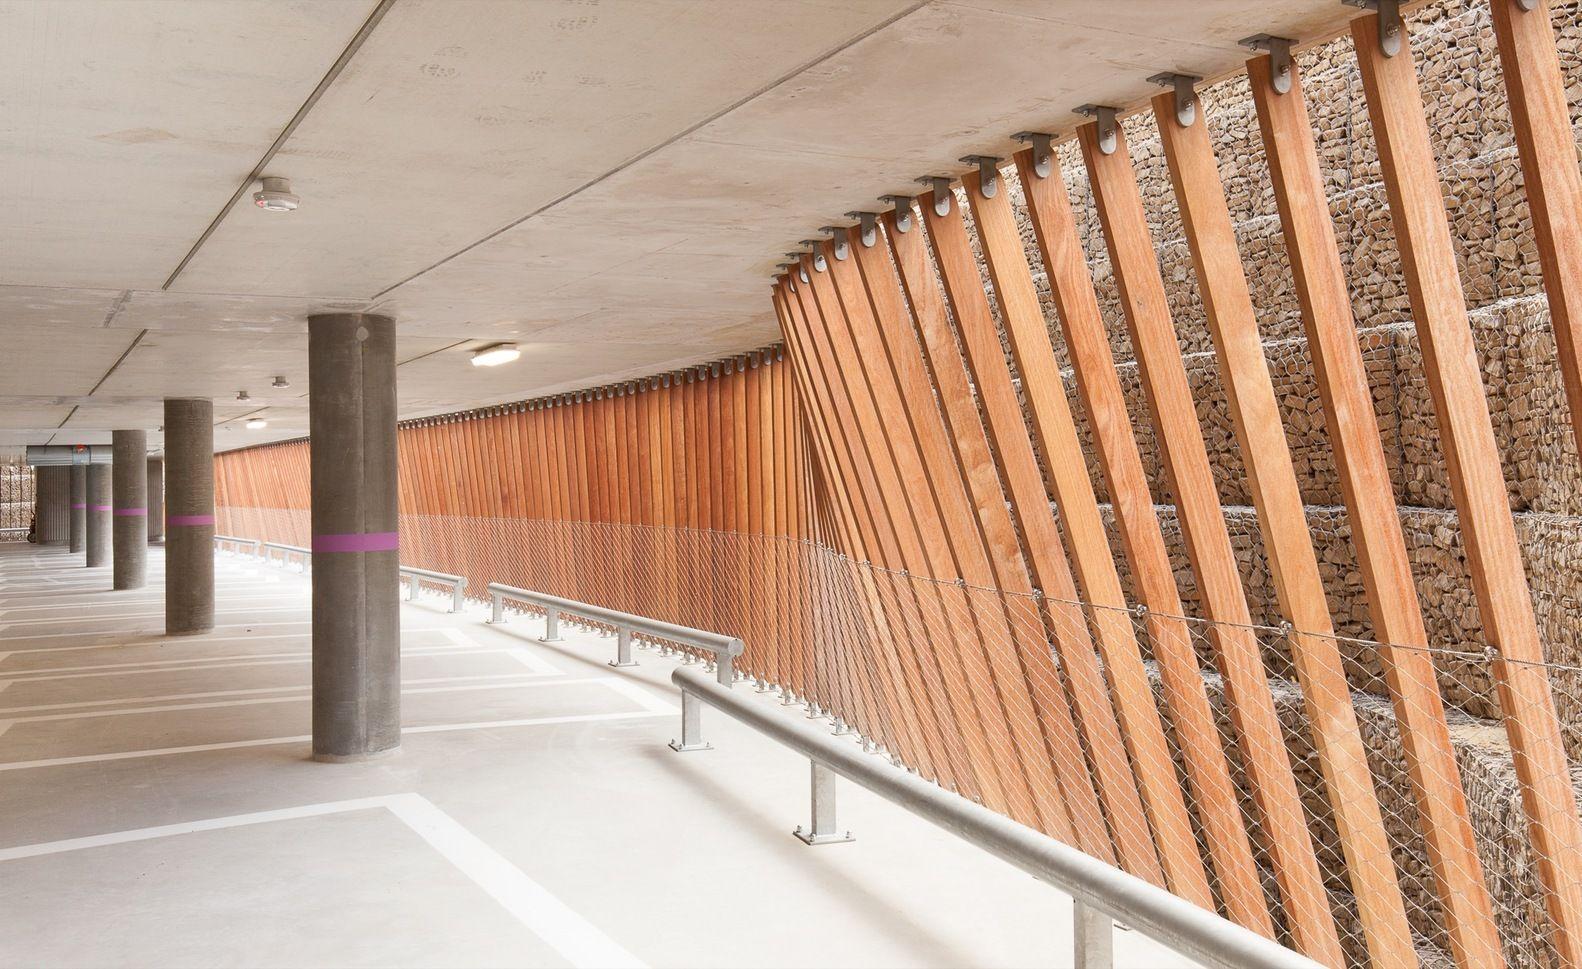 Gallery Of Parking Garage Cliniques Universitaires Saint Luc